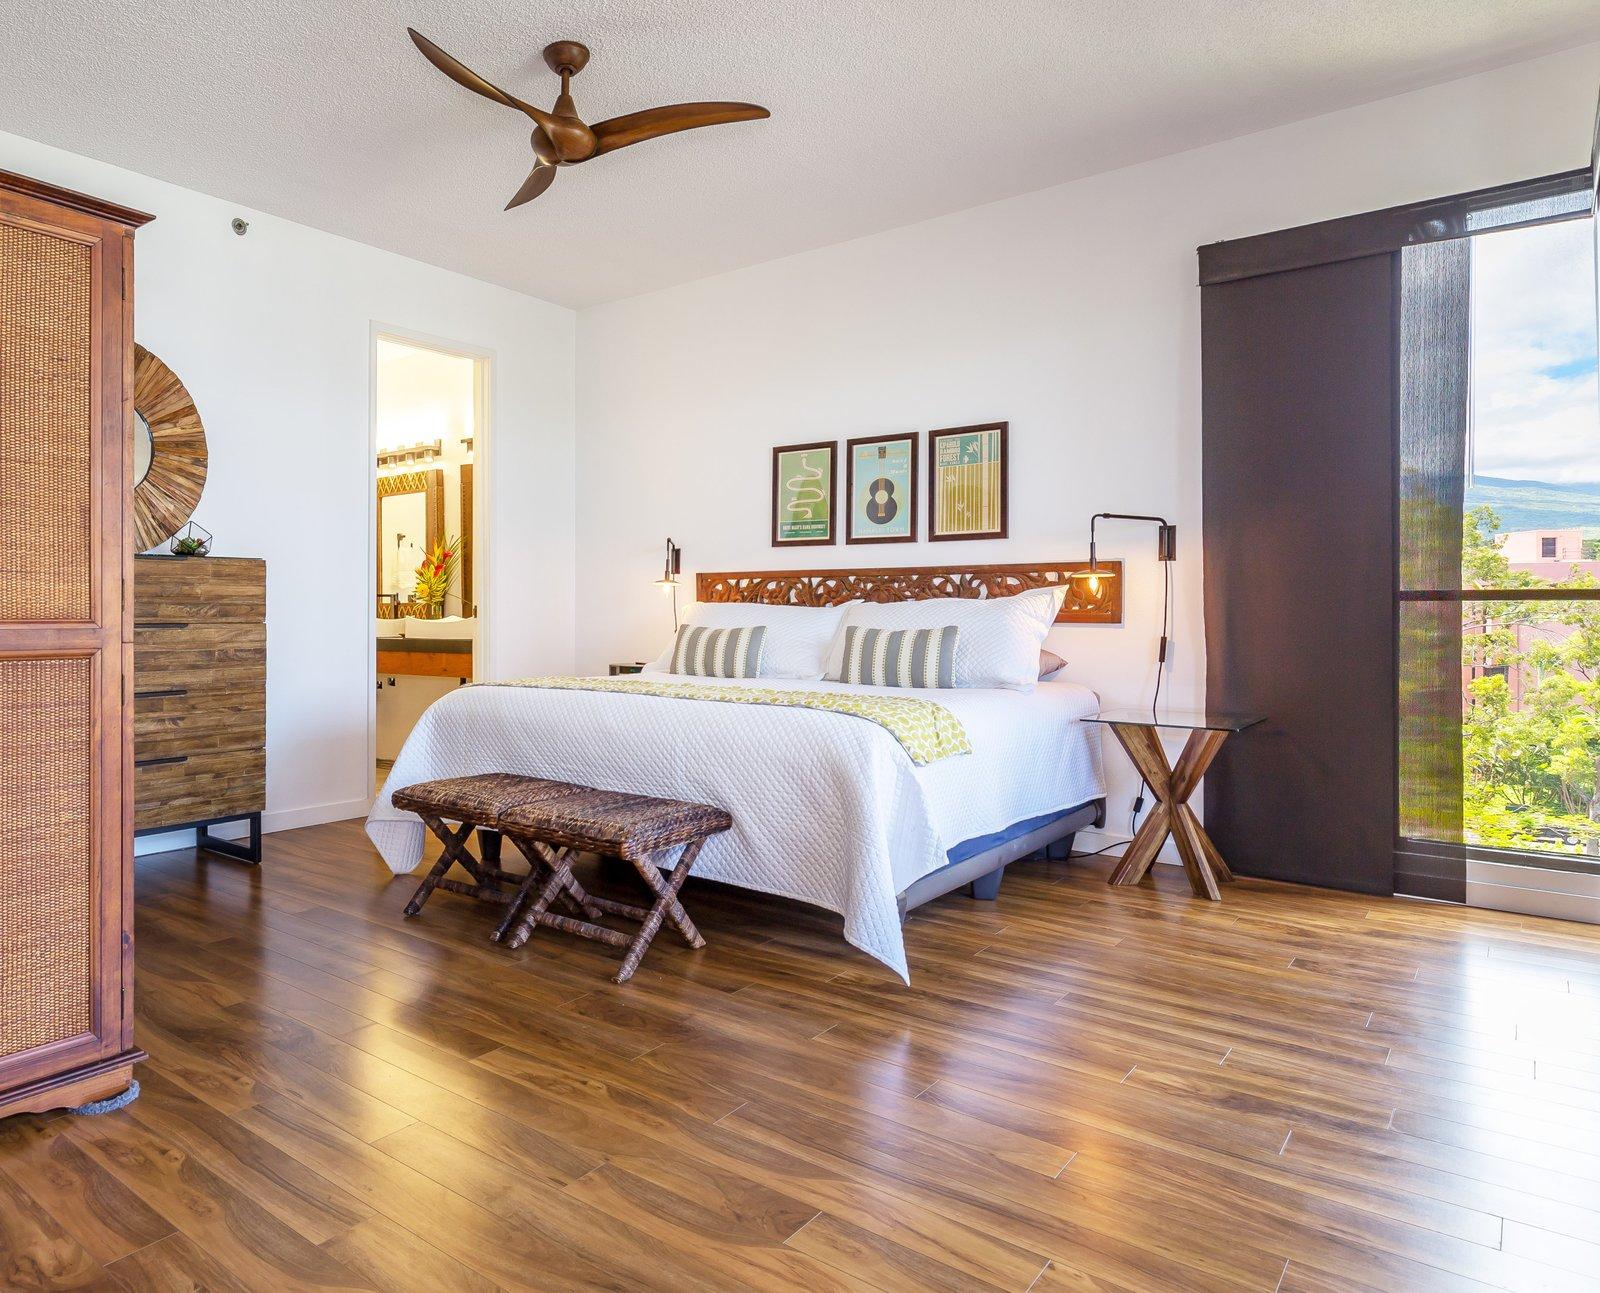 Bedroom, Accent Lighting, Night Stands, Storage, Dresser, Medium Hardwood Floor, Bench, Bed, Laminate Floor, and Wall Lighting Master bedroom with antique Balinese headboard.   Maui Modern, Budget-Luxury Remodeled Vacation Rental